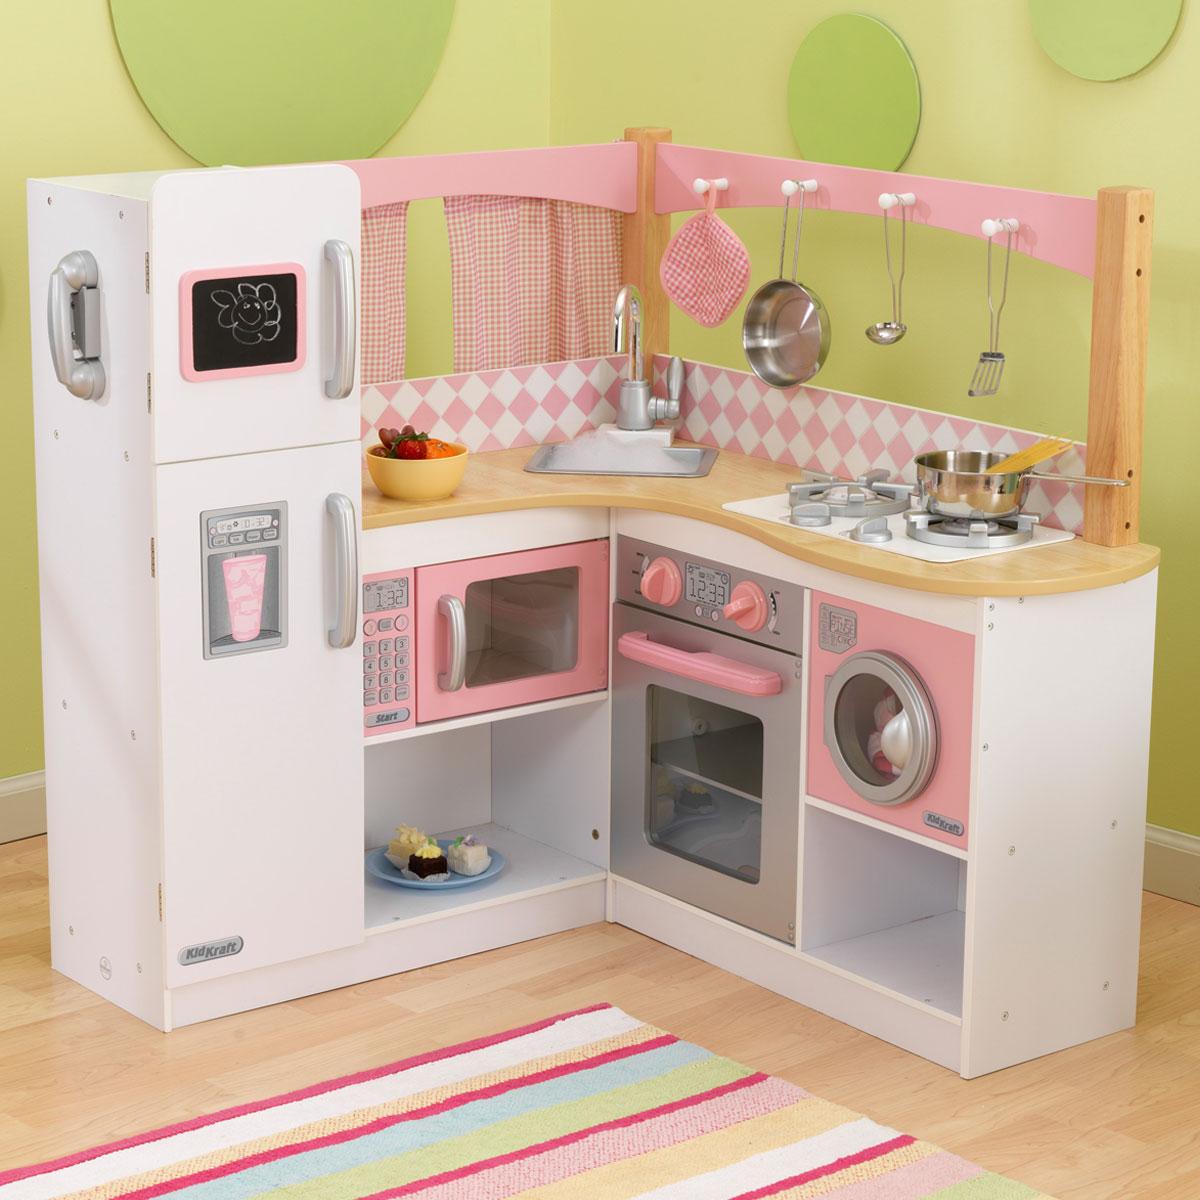 cuisine grand gourmet de kidkraft. Black Bedroom Furniture Sets. Home Design Ideas